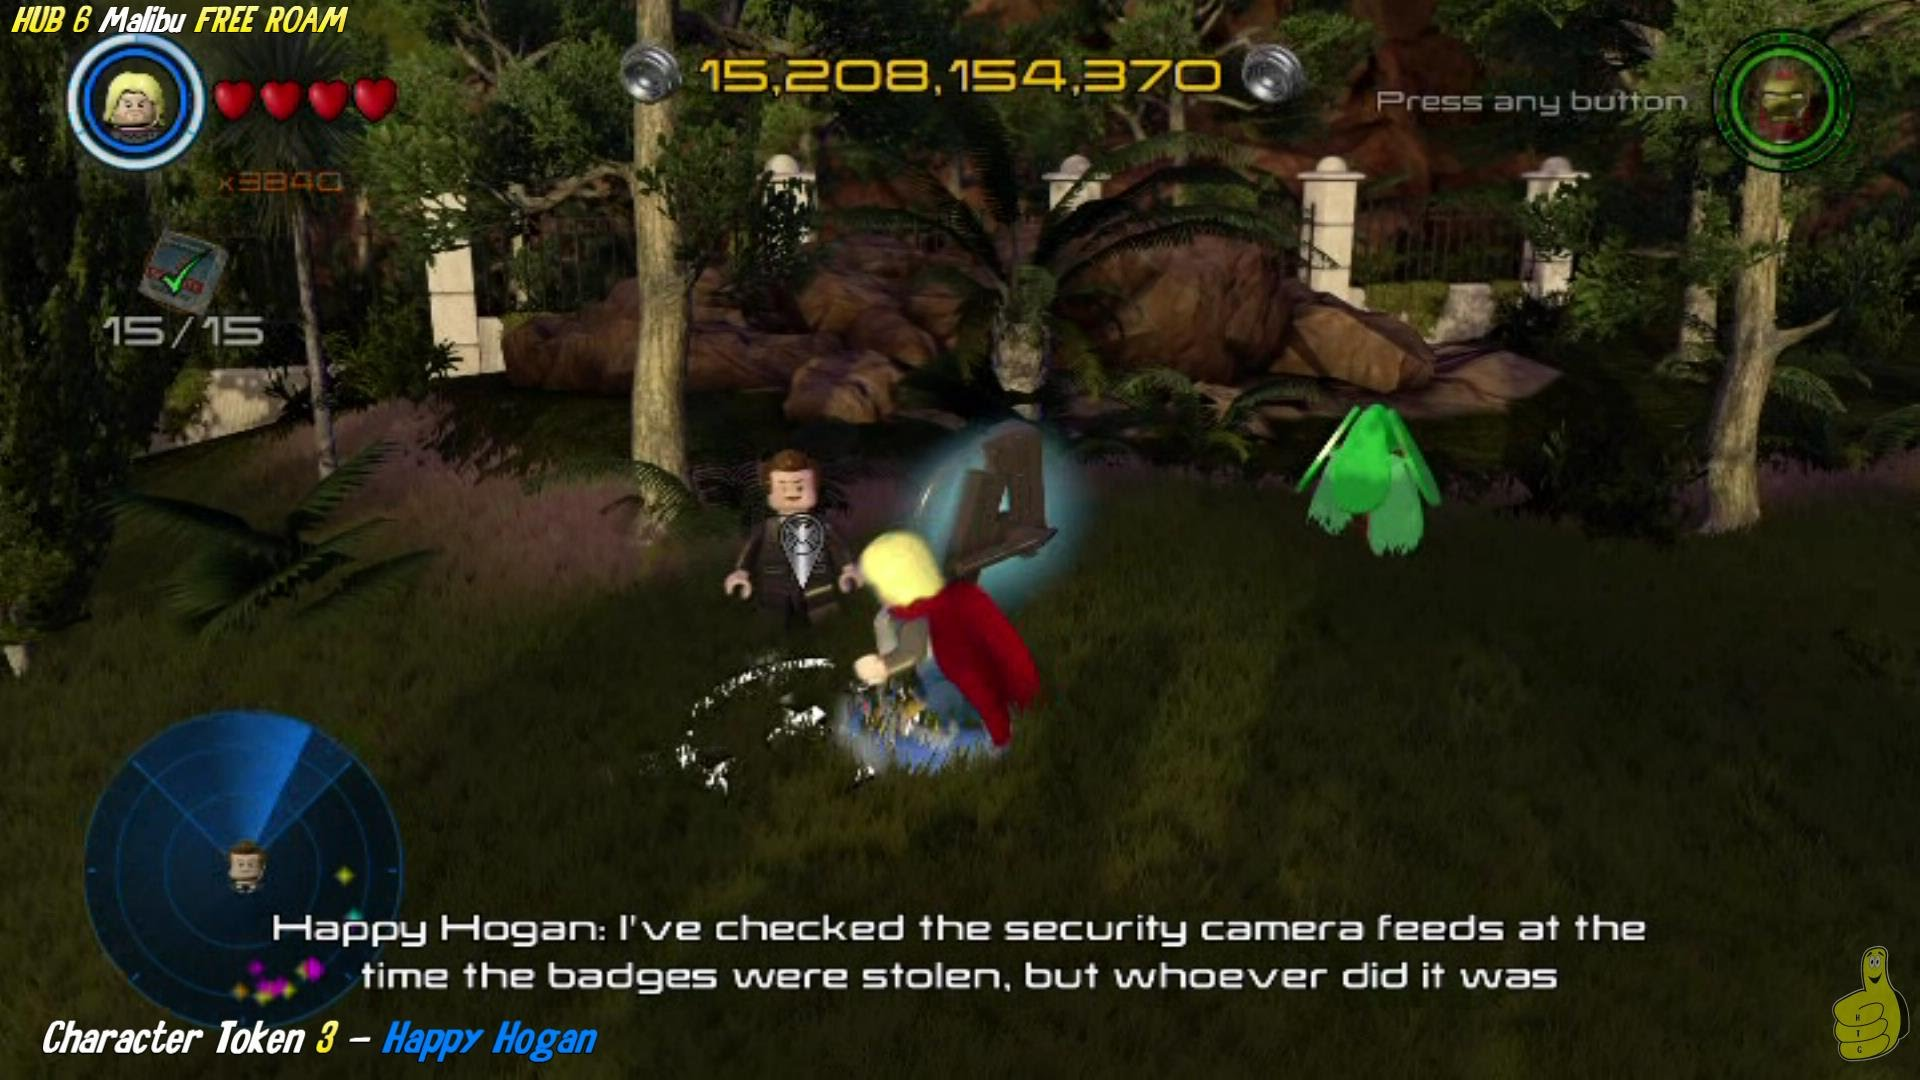 Lego Marvel Avengers: HUB 6 / Malibu FREE ROAM (All Collectibles) – HTG